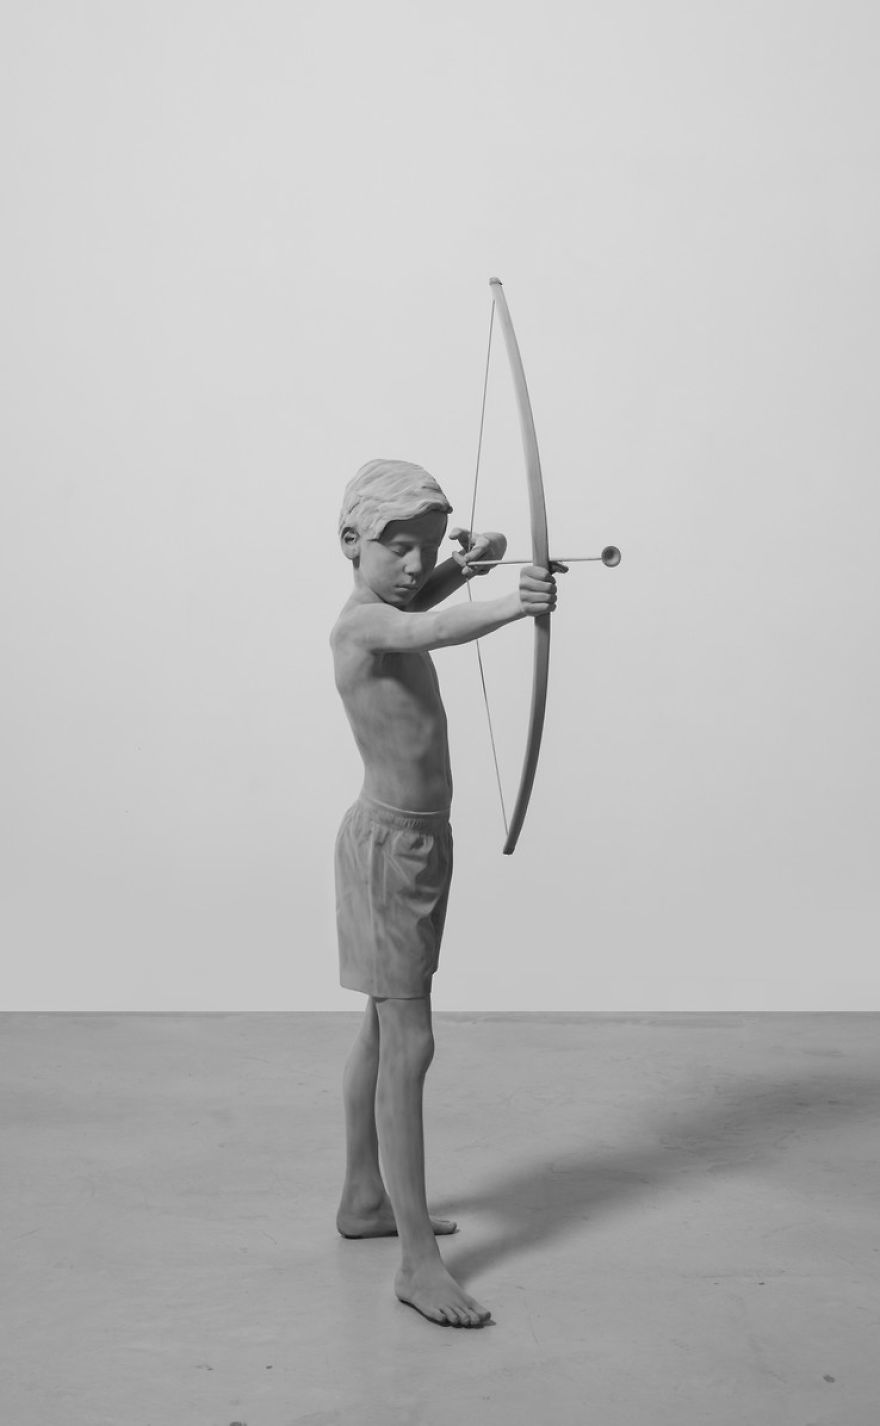 Incredibly Lifelike Sculptures By Belgian Artist